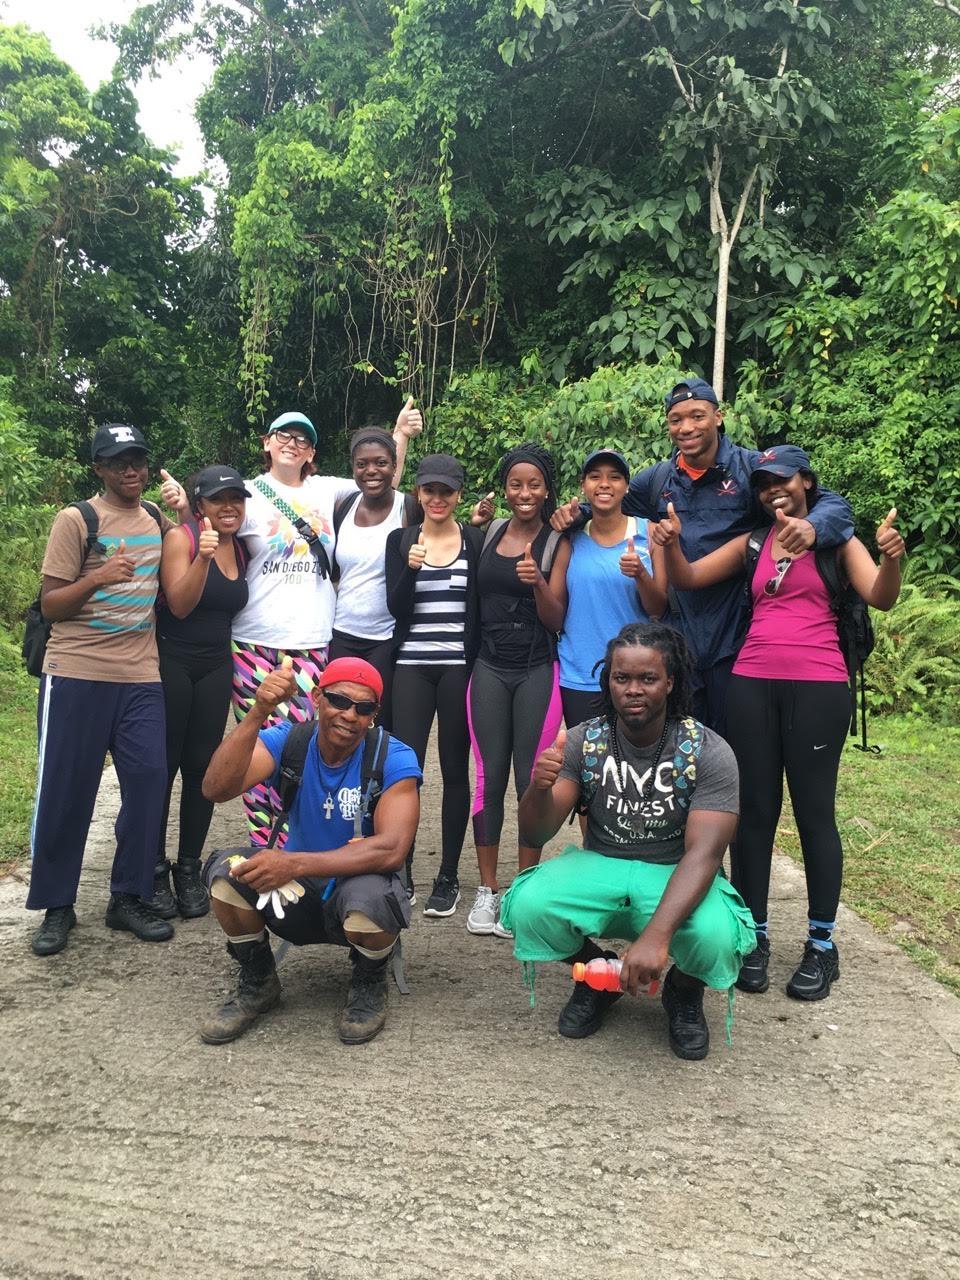 Photo Credit: 2016 CGH Scholars Maha Hassan and Deega Omar and MHIRT Scholars - Nevis Peak, Nevis